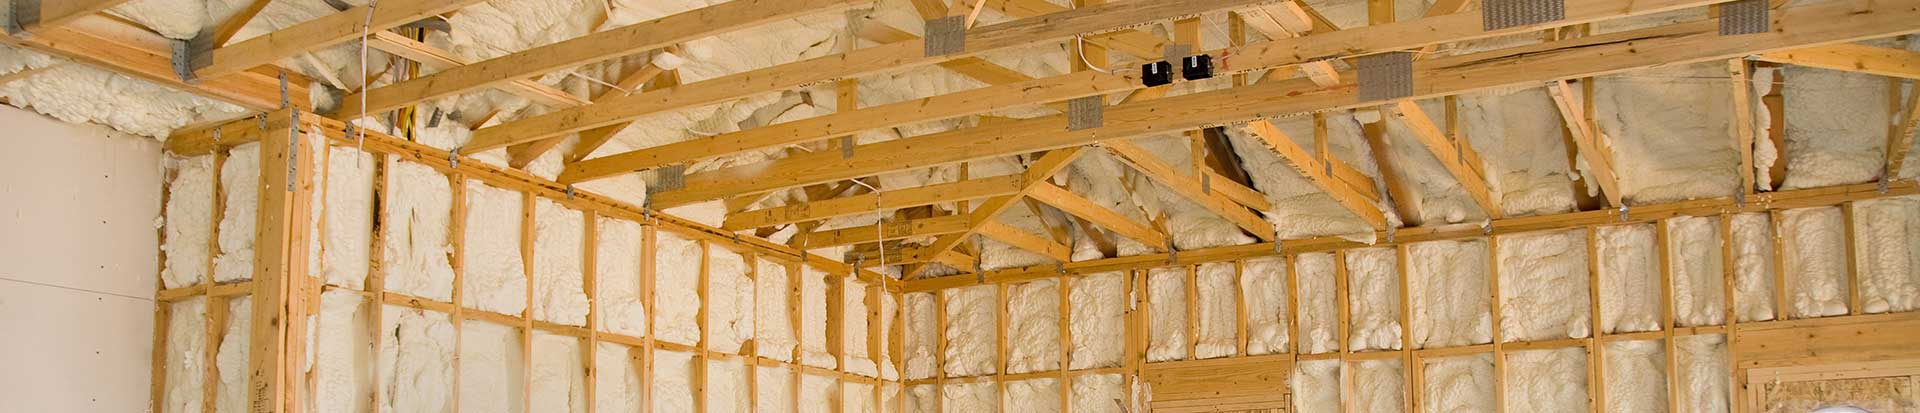 foam insulation company michigan